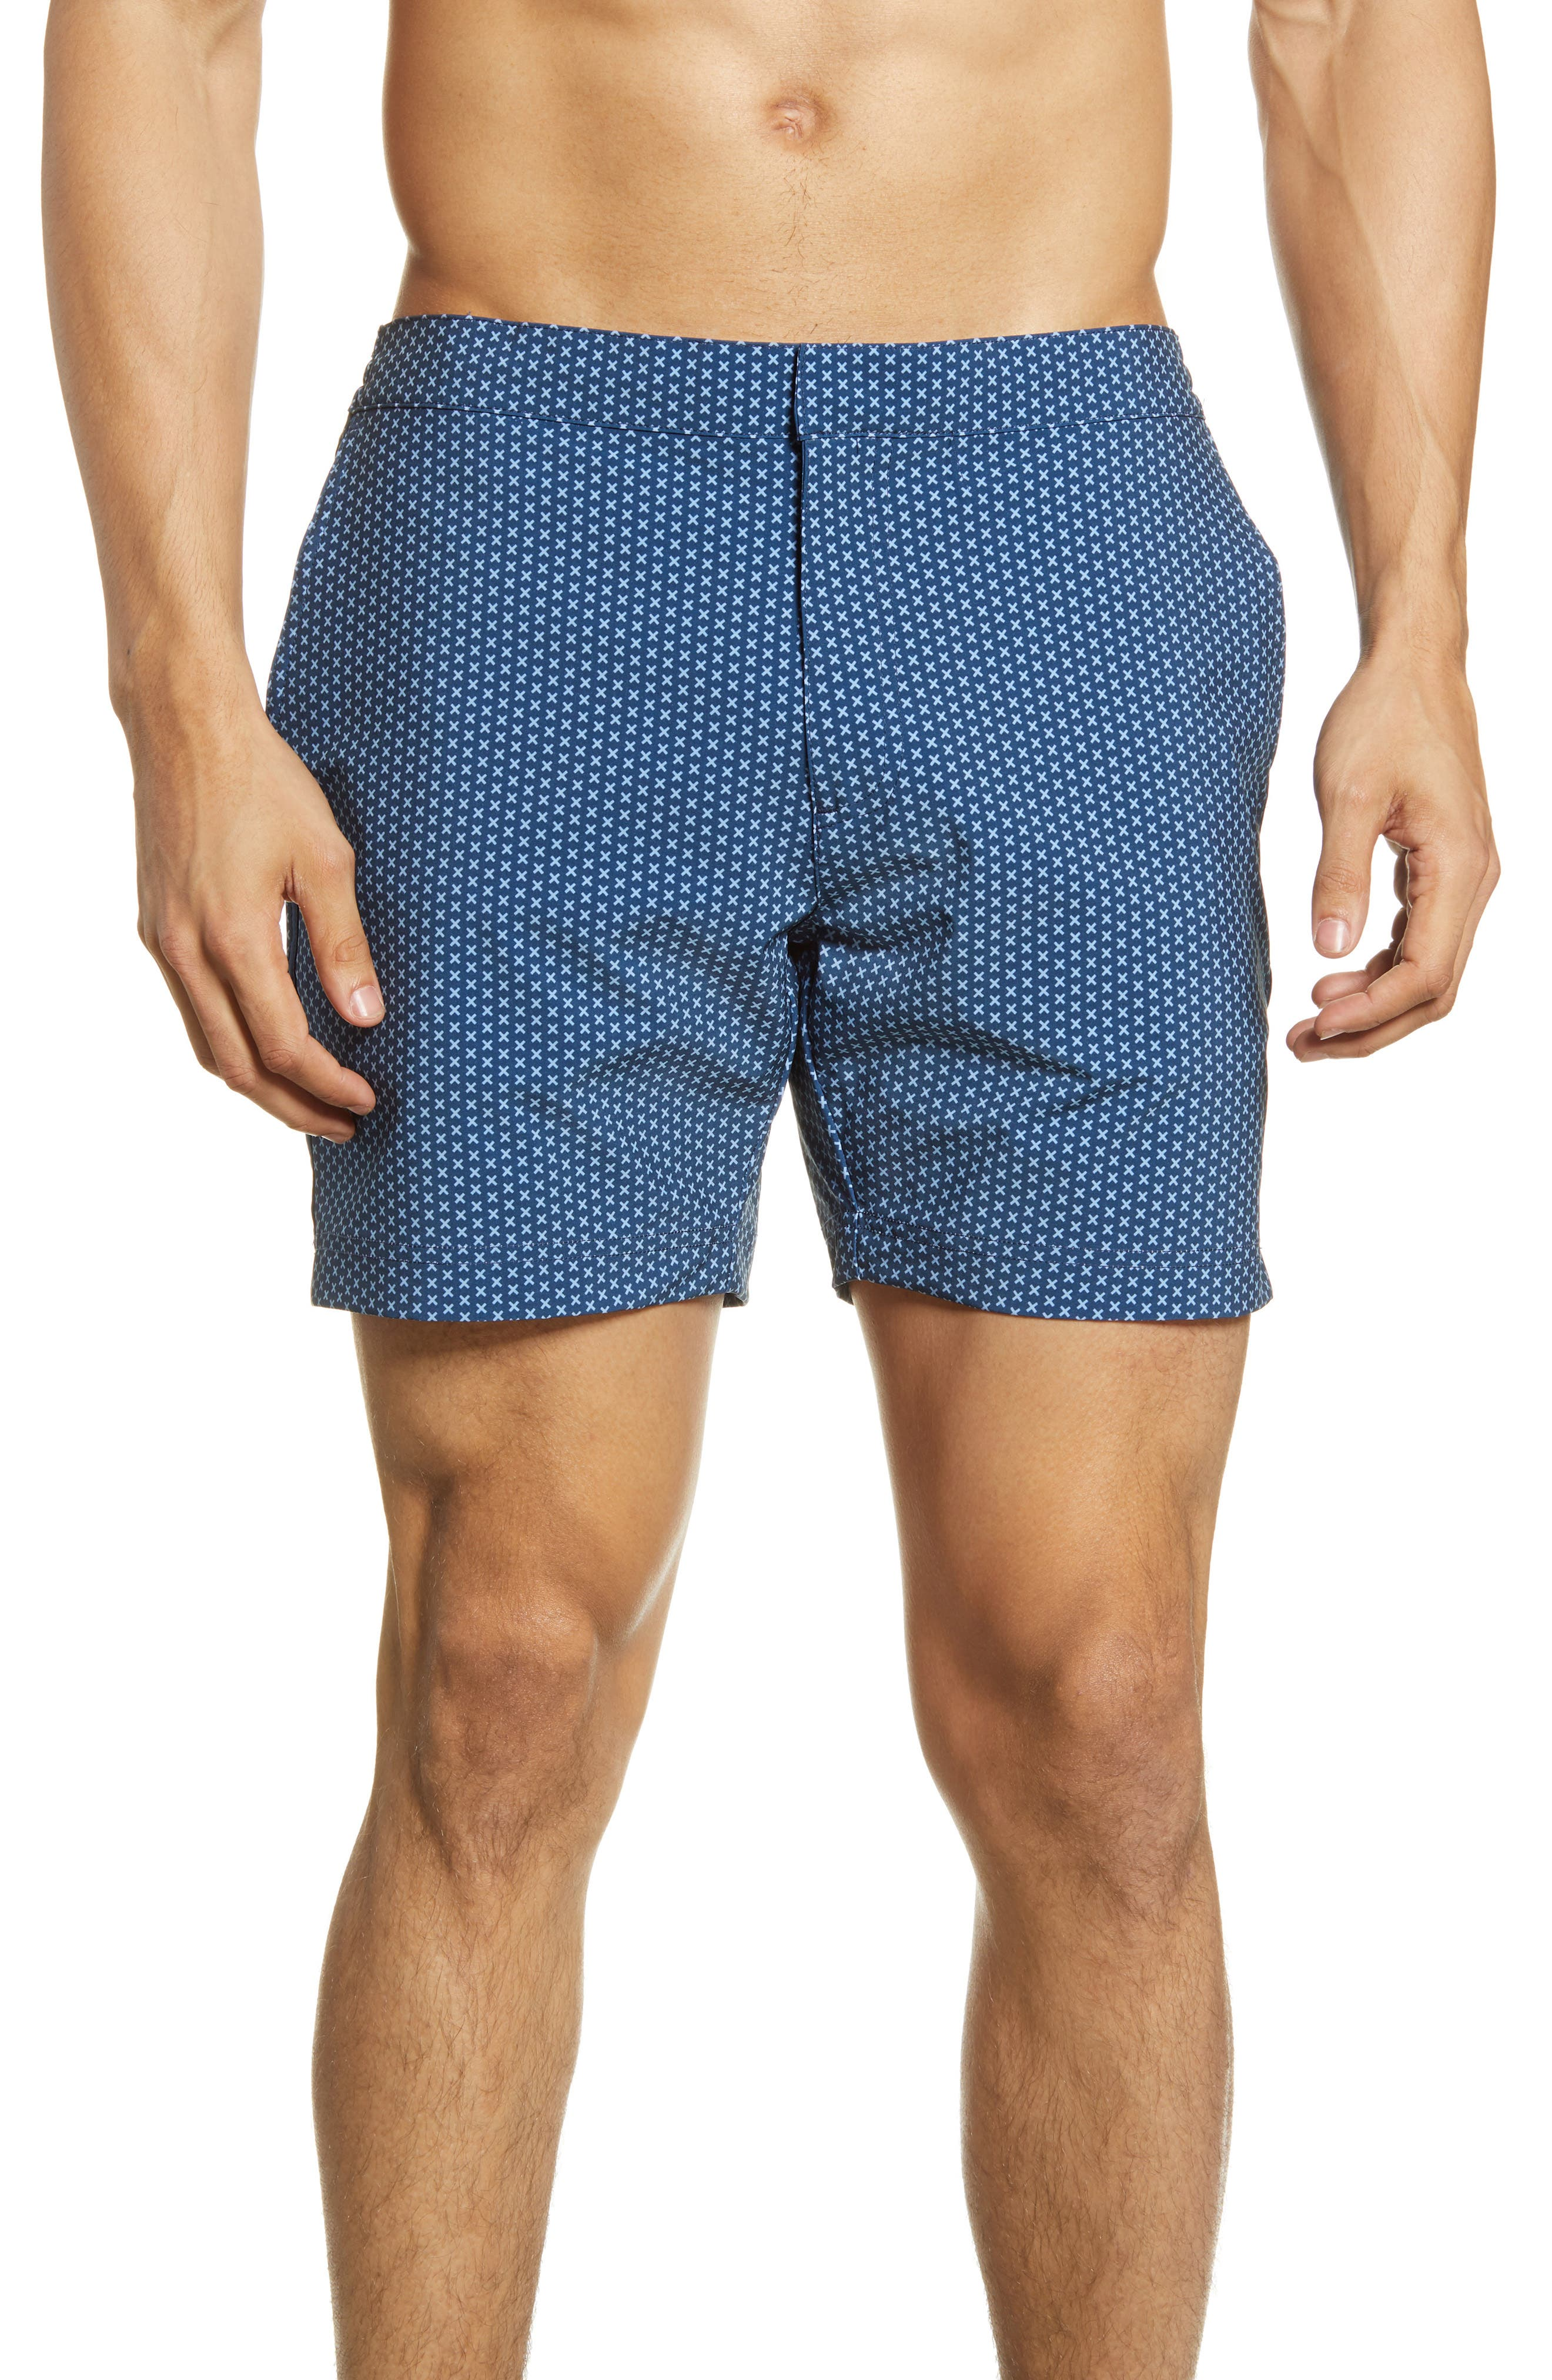 Vintage Men's Swimsuits – 1930s, 1940s, 1950s History Mens Fair Harbor The Sextant Swim Trunks Size 34 - Blue $88.00 AT vintagedancer.com